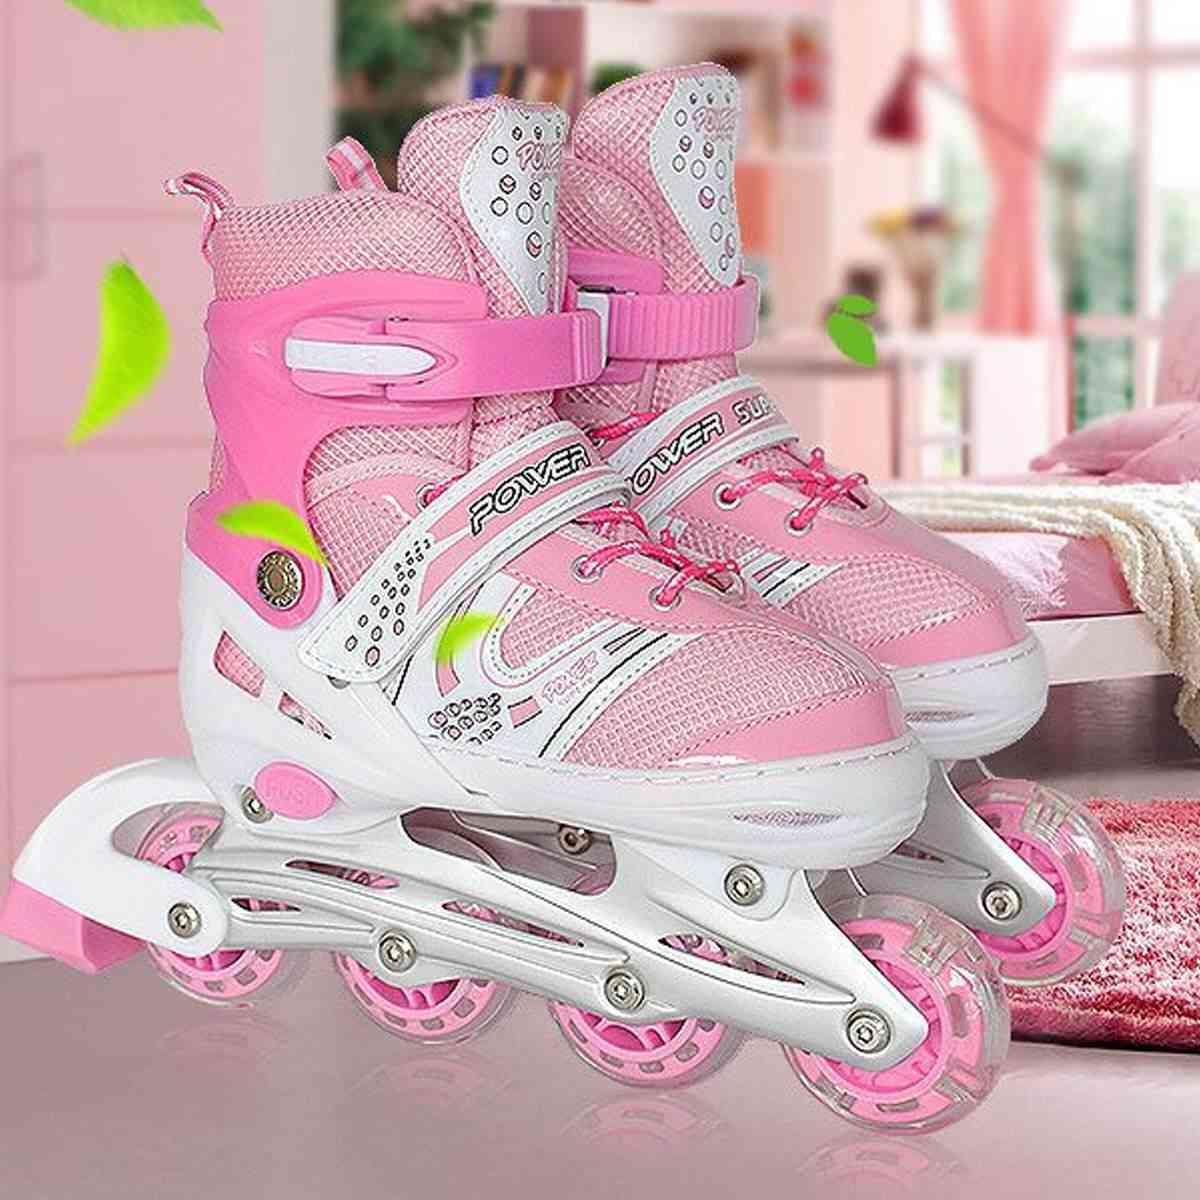 Professional Kids Inline Skates